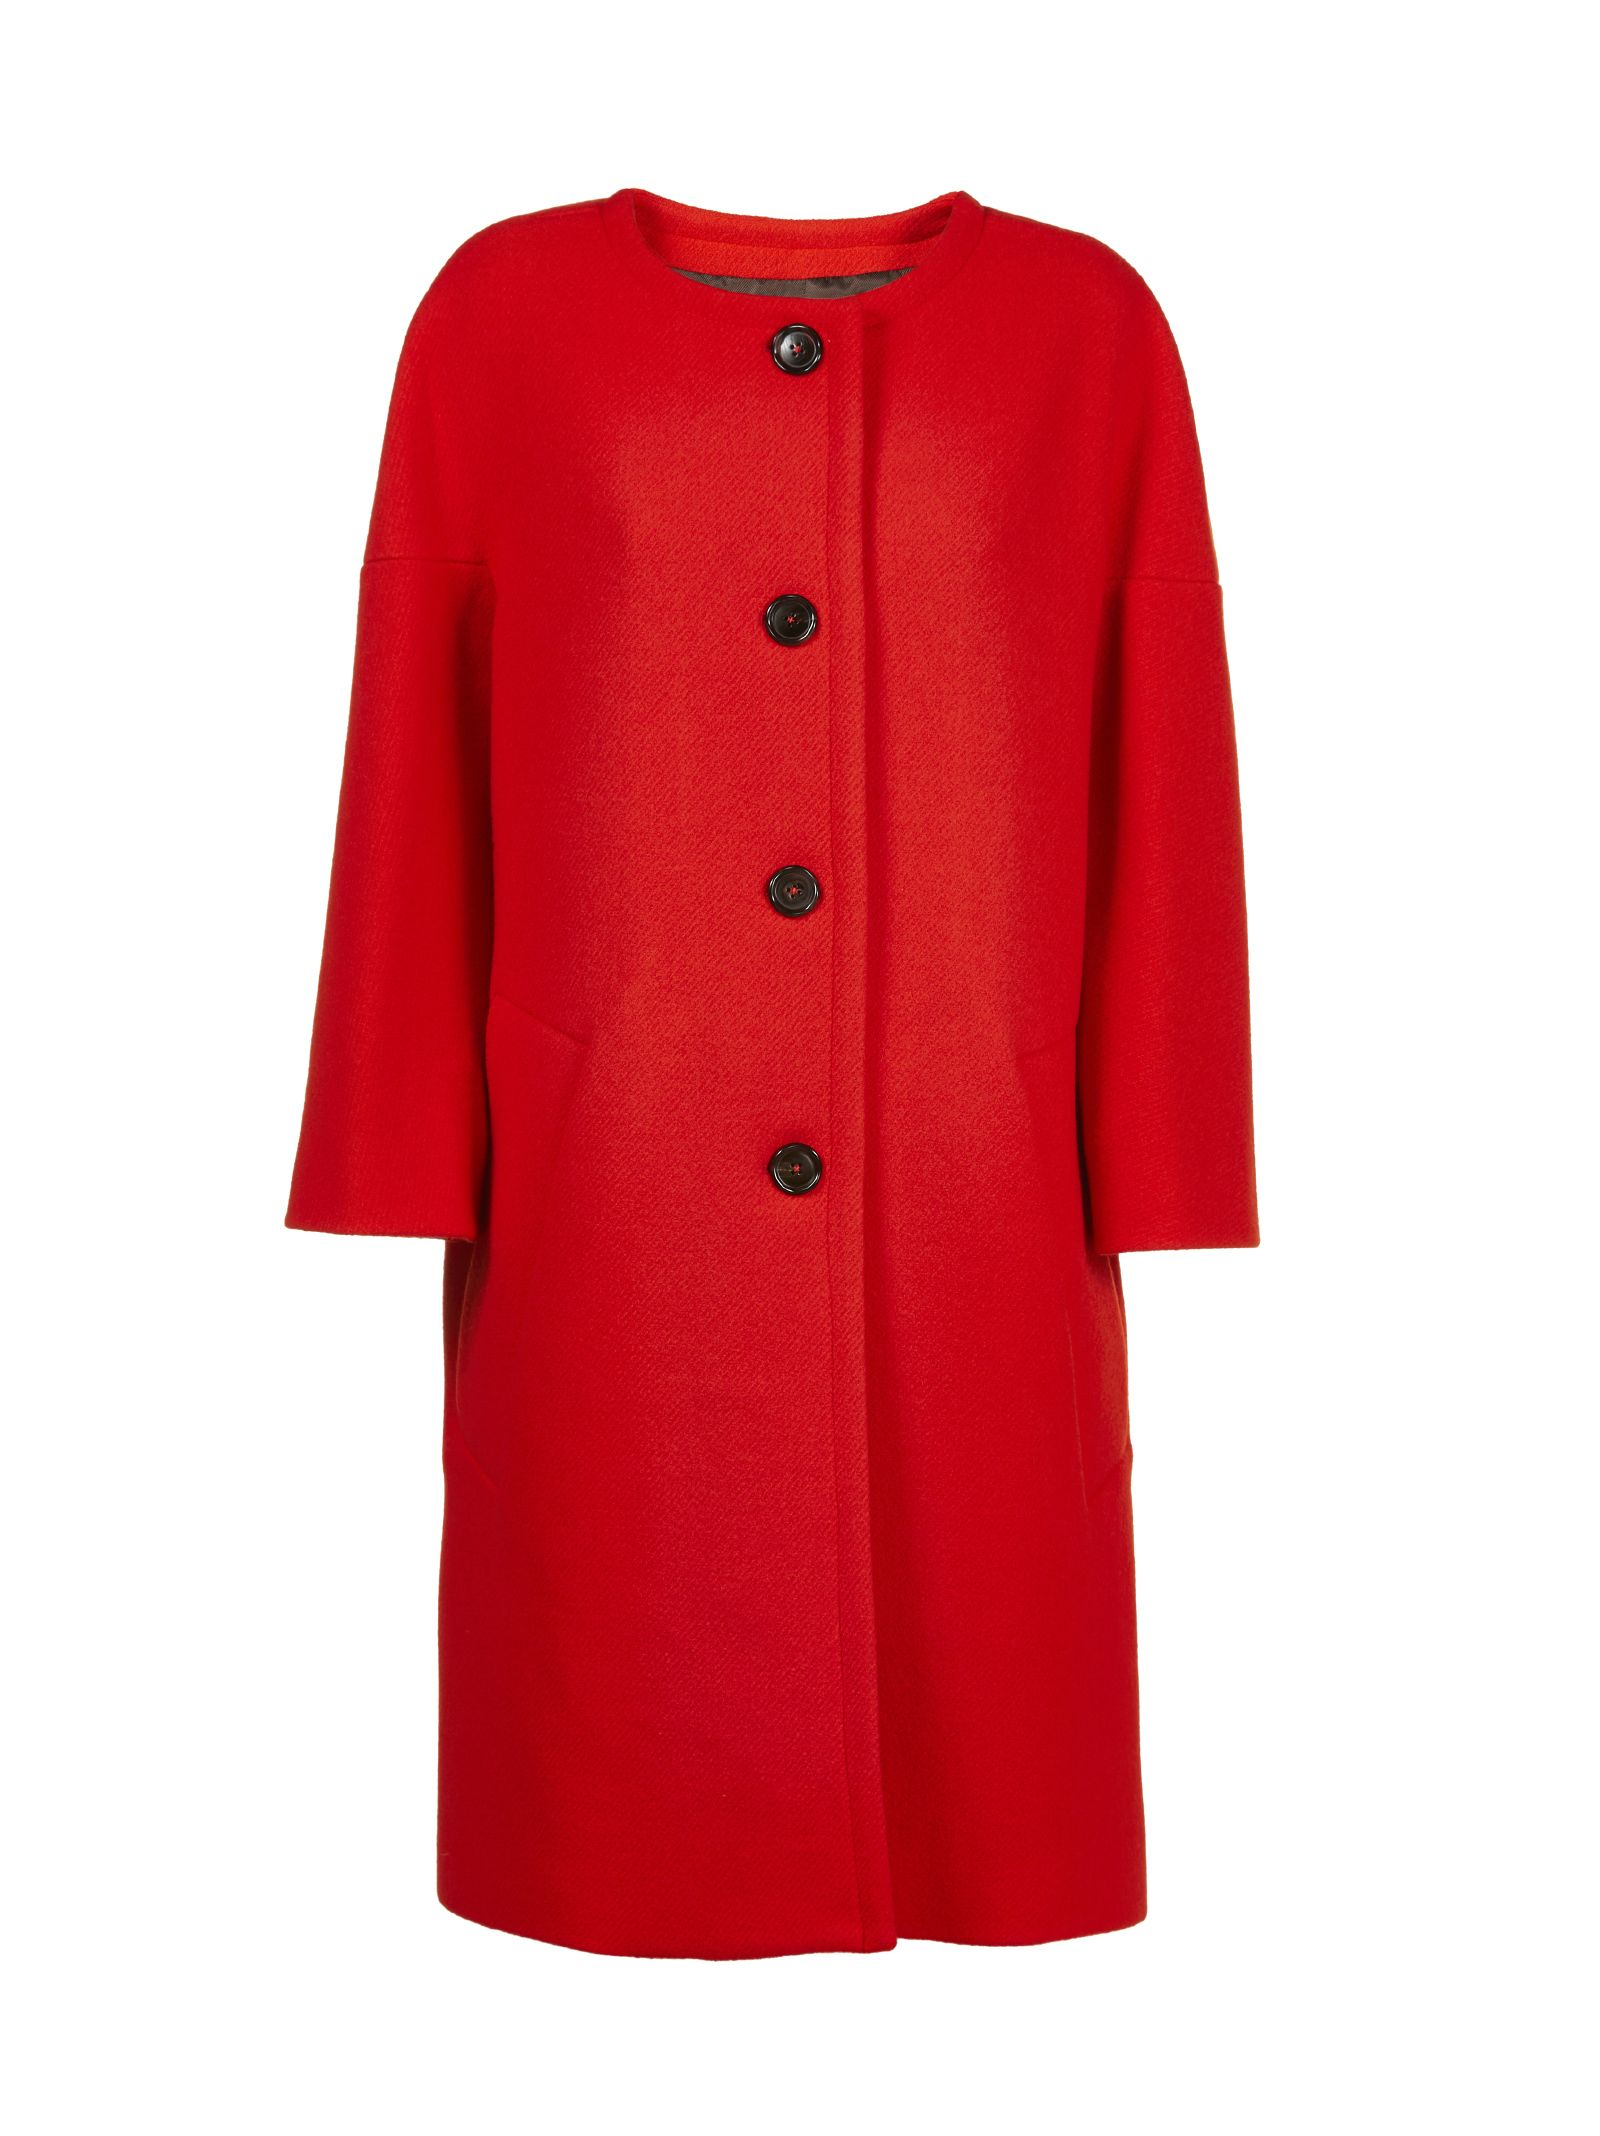 Vintage Coat, Corallo